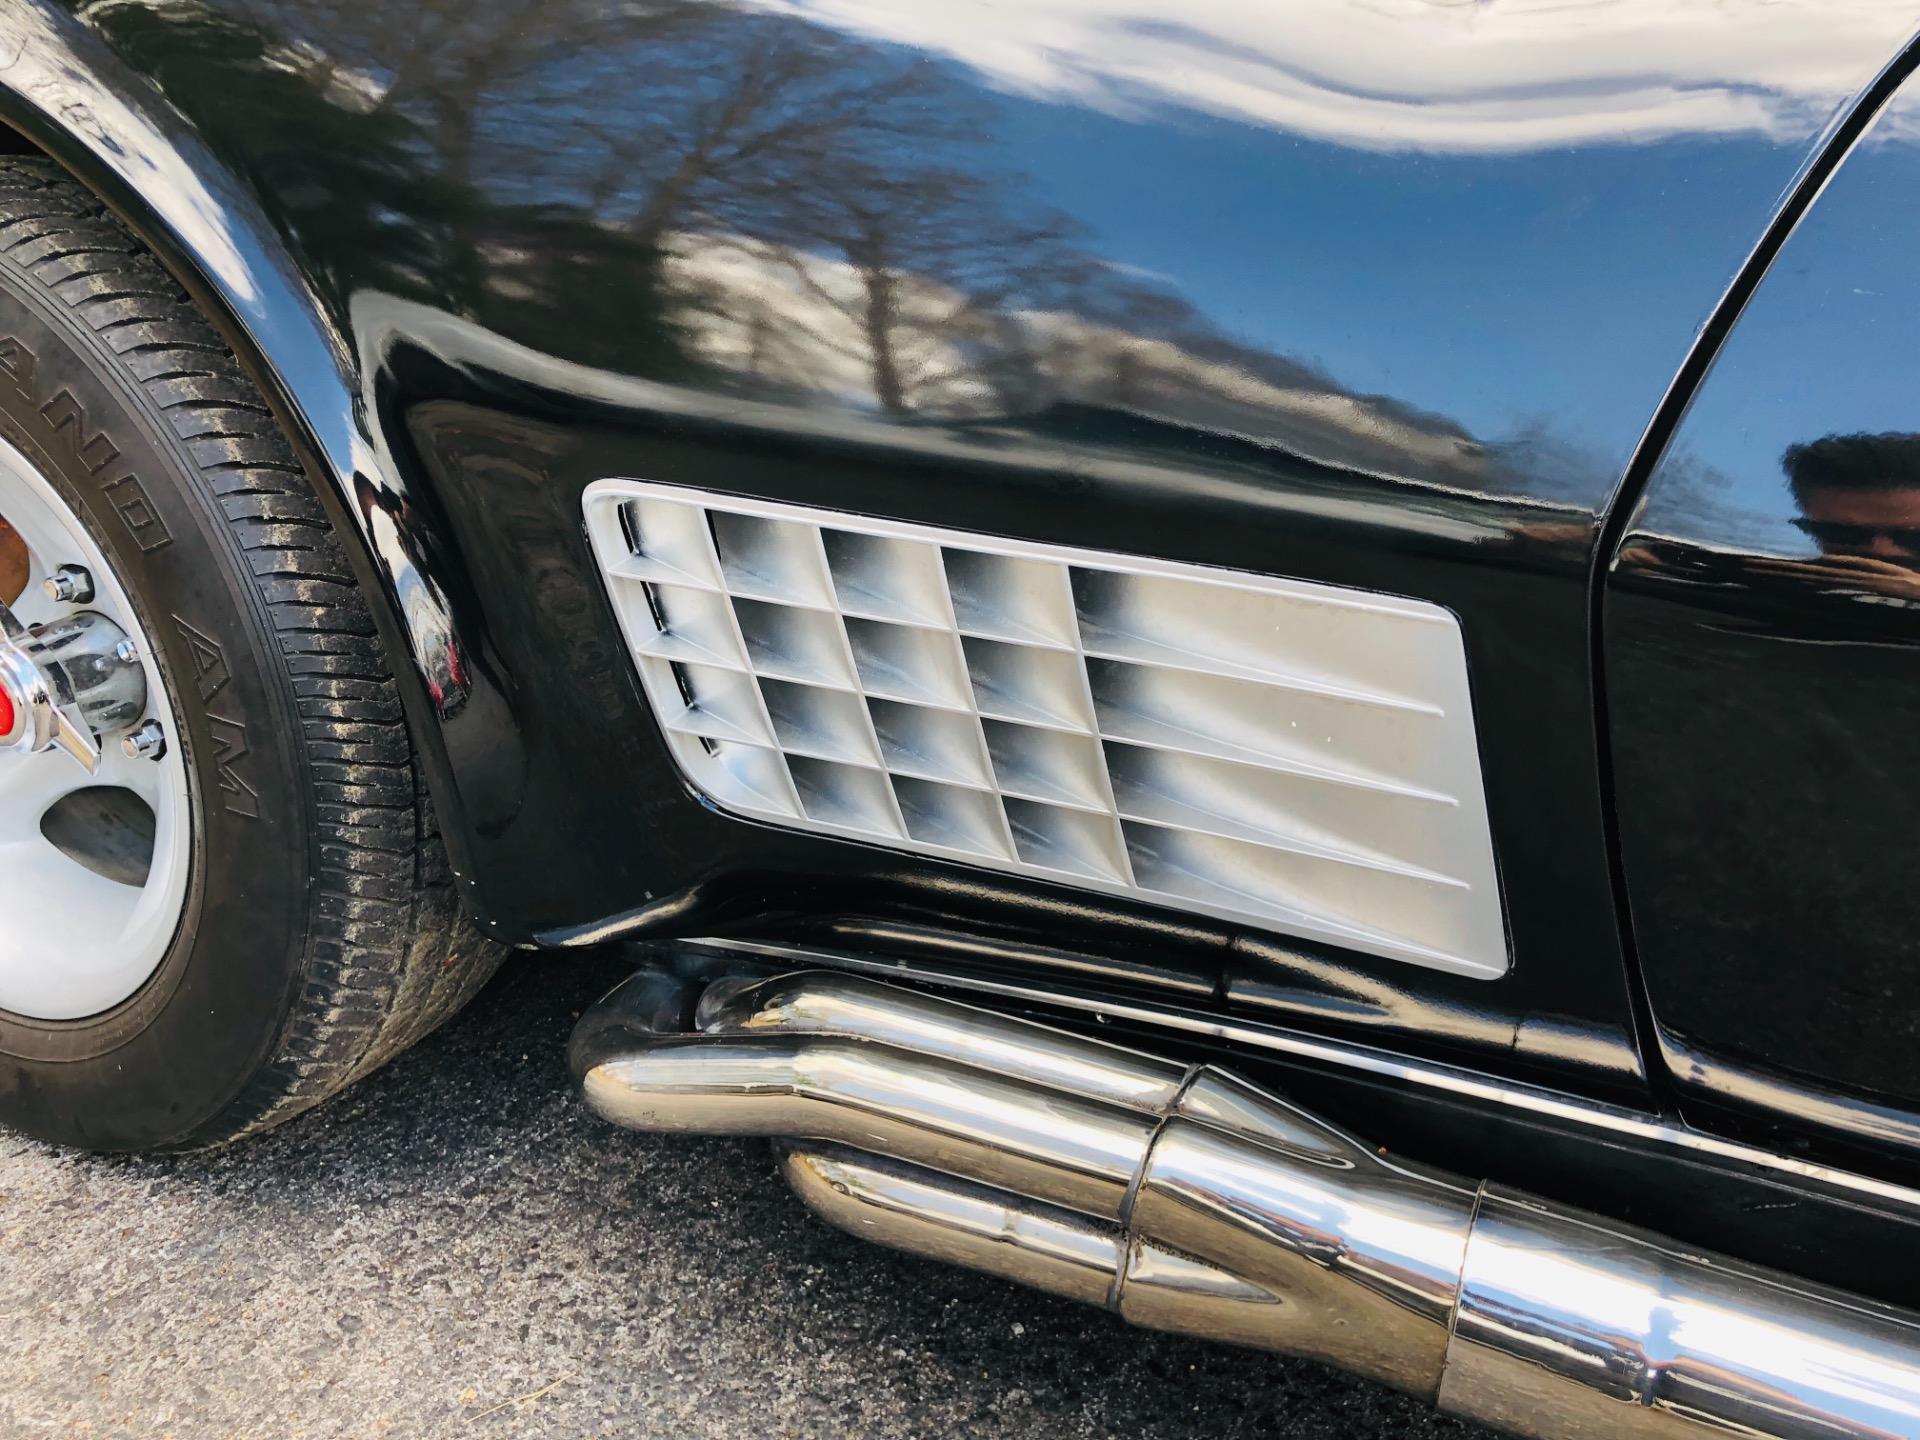 Used 1970 Chevrolet Corvette -SUPERCHARGED-BDS BLOWER-HIGH HORESPOWER-NOSTALGIC SHARK-SEE VIDEO | Mundelein, IL